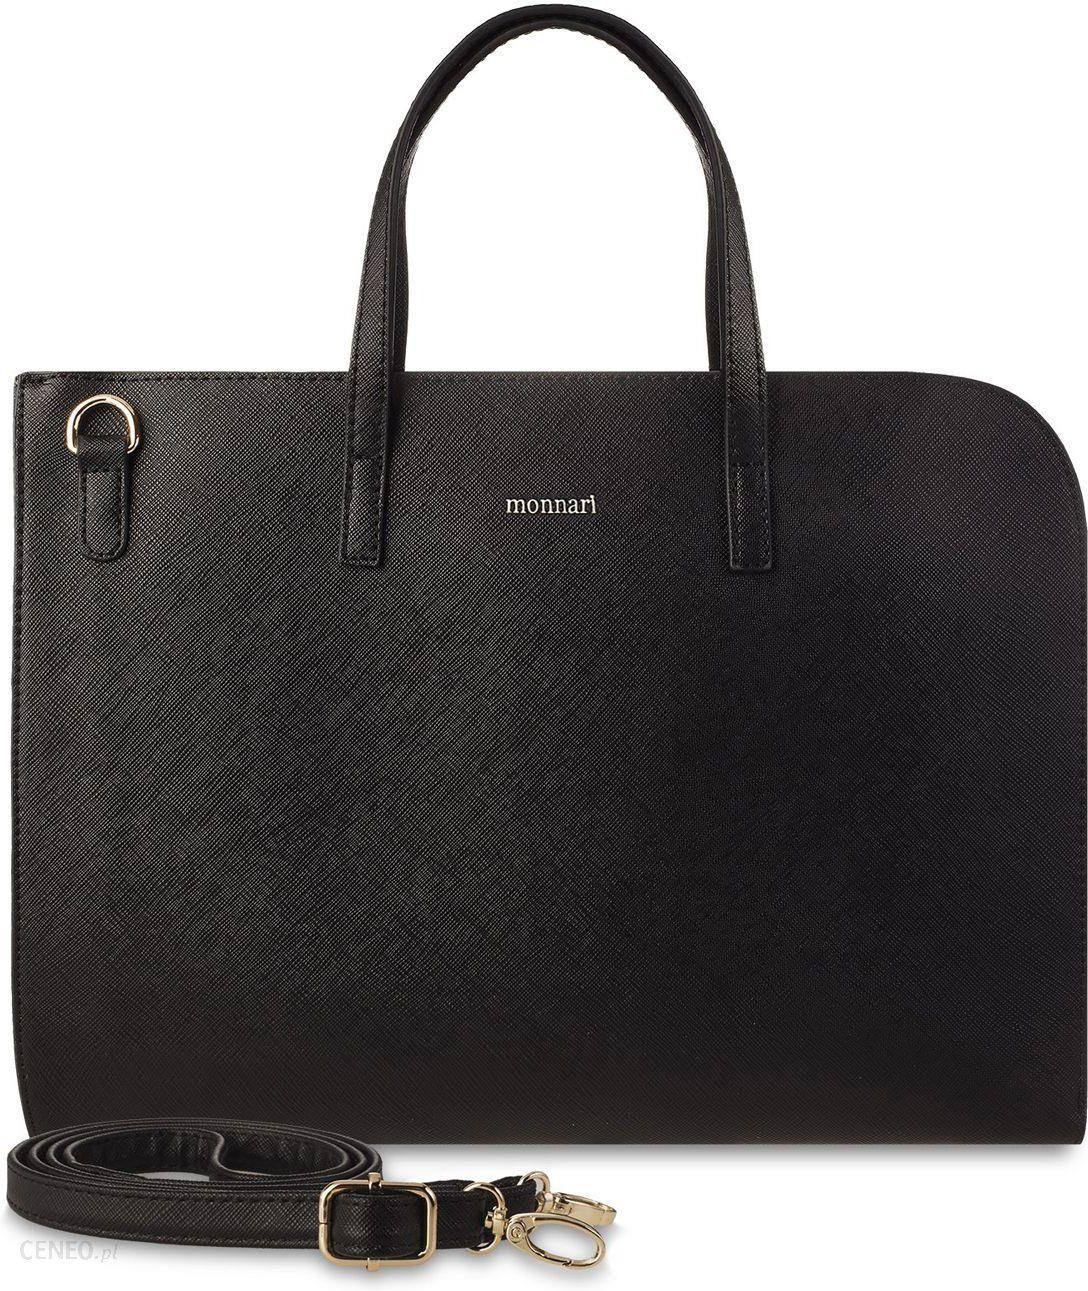 0f9b4741e3b10 Klasyczna aktówka monnari torba na laptopa torebka teczka na dokumenty -  czarny - zdjęcie 1